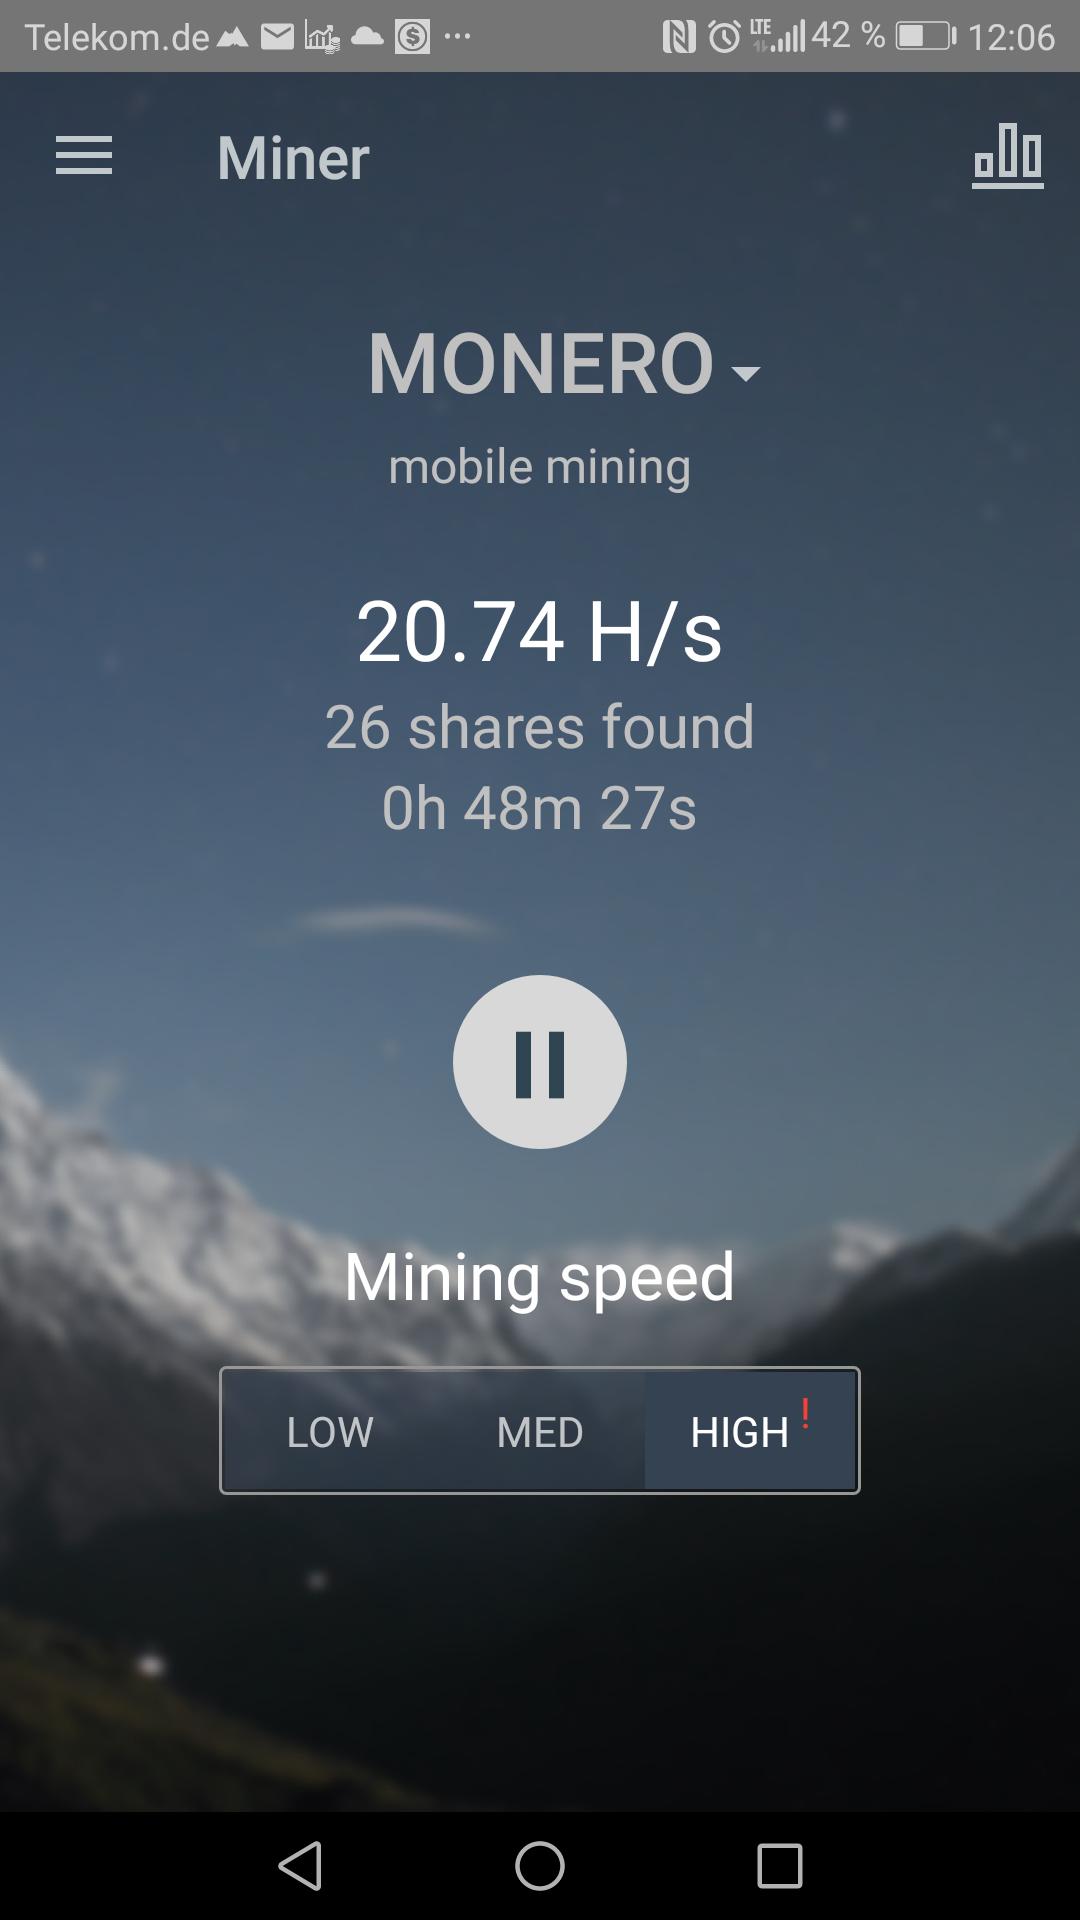 Bitcoin-Mining-59-Rendite-im-Jahr-Kommentar-Oliver-Baron-GodmodeTrader.de-2